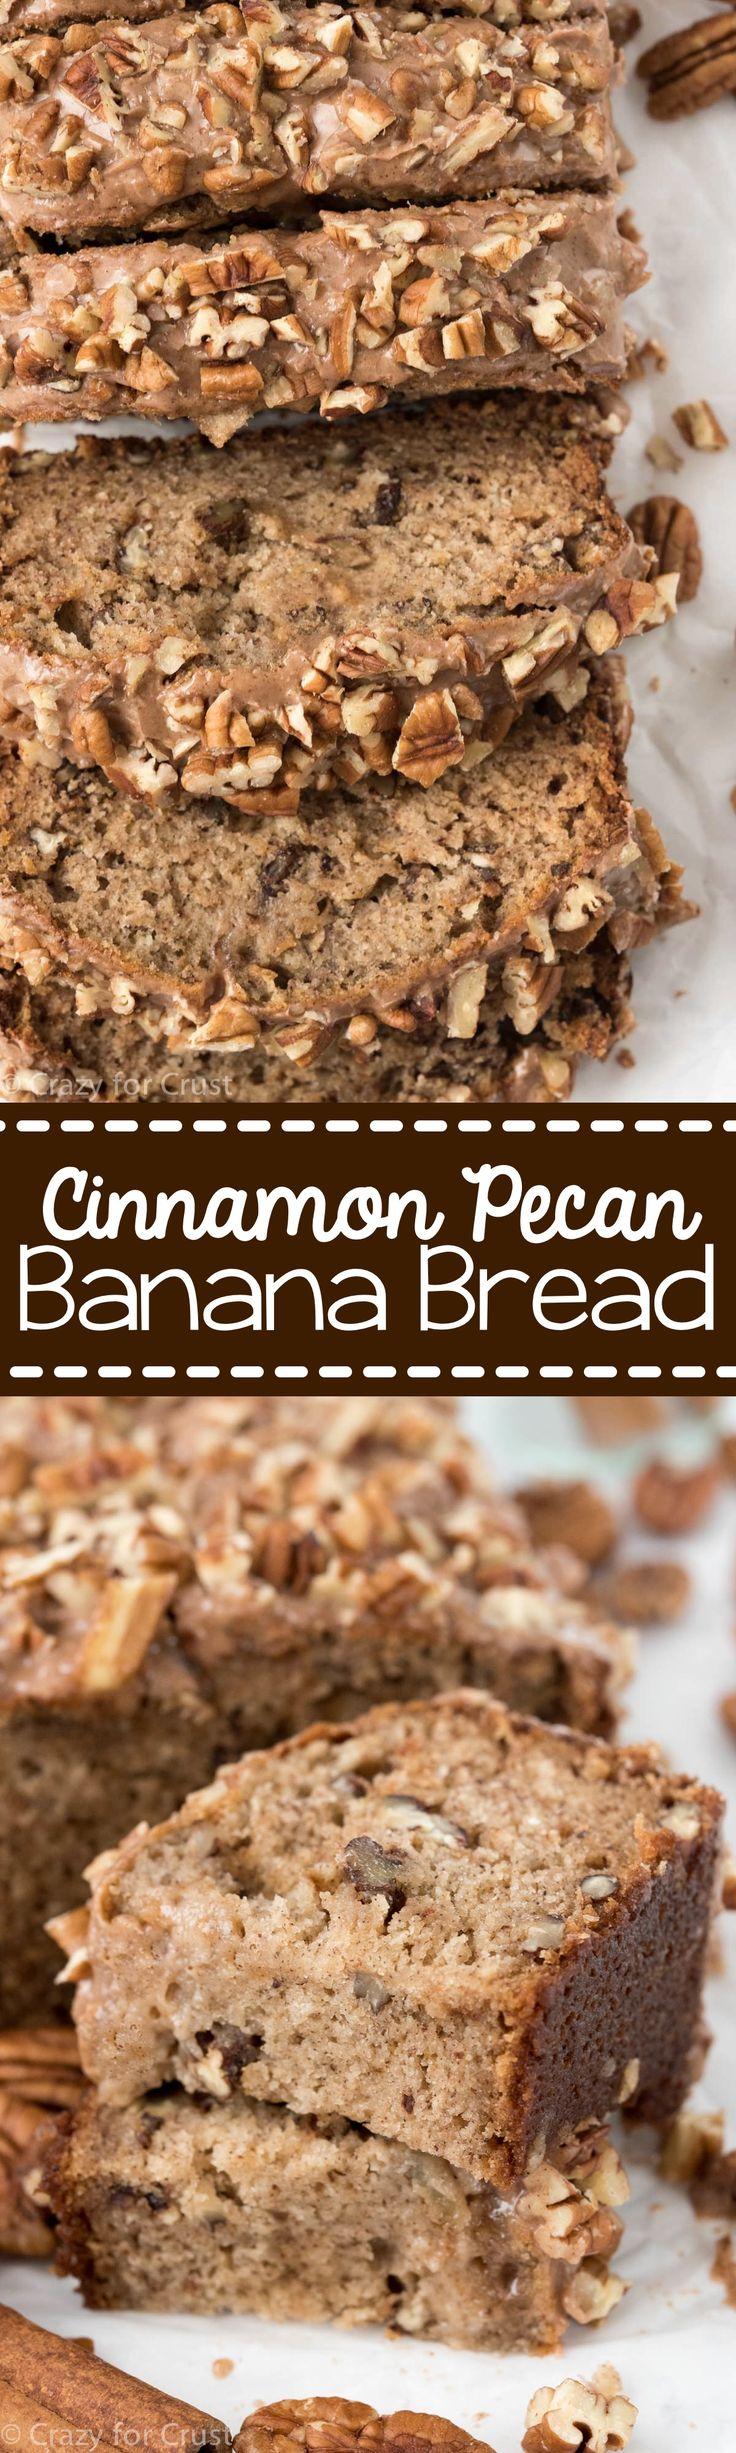 Cinnamon Pecan Banana Bread - the perfect easy banana bread recipe! My mom's banana bread recipe filled with cinnamon, pecans, and a cinnamon glaze!